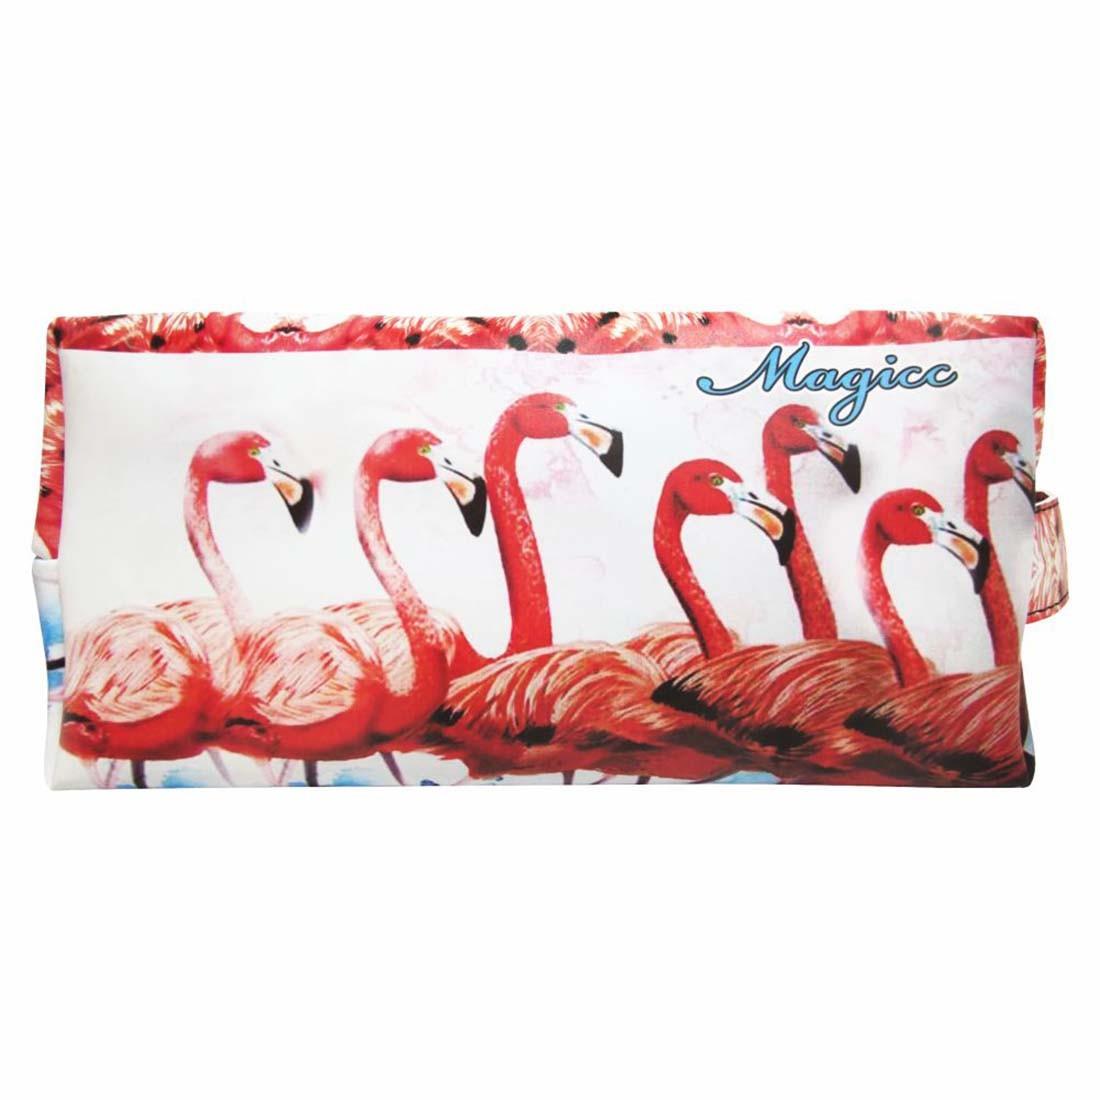 Necessaire Feminina Tropical Flamingos Vermelhos, Magicc